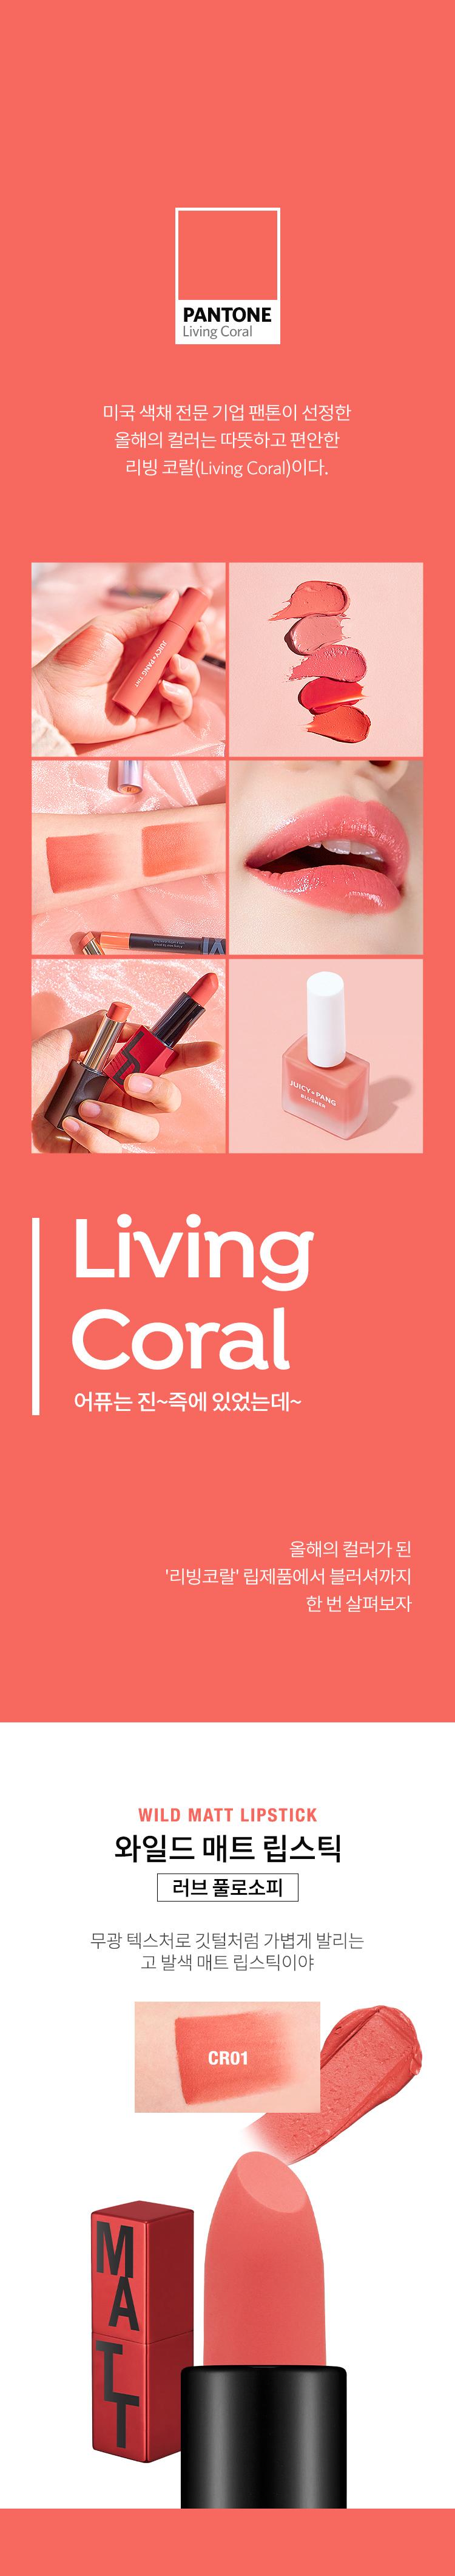 MC_LivingCoral_01.jpg